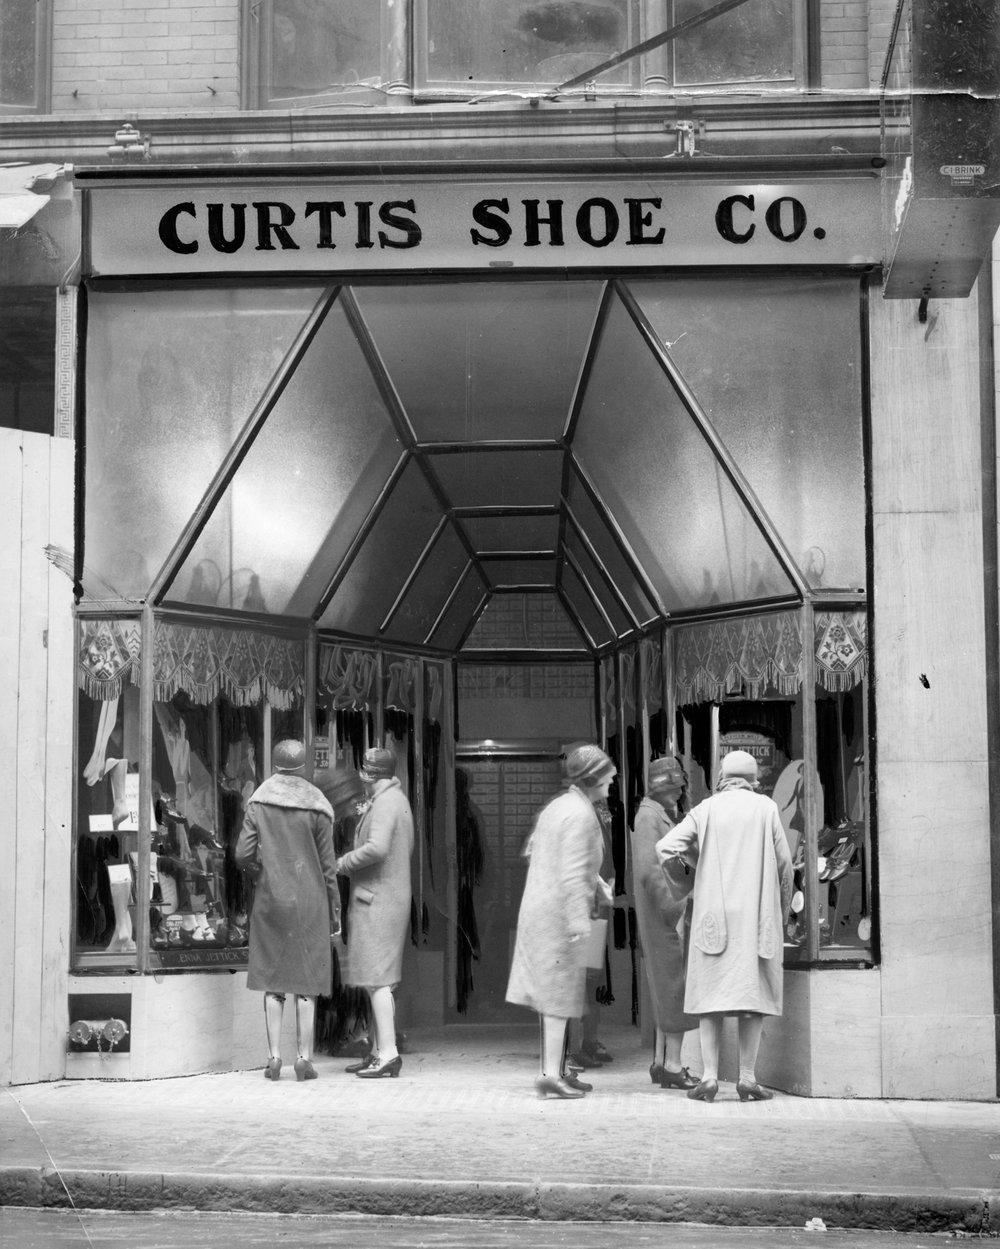 Curtis Shoe Co.